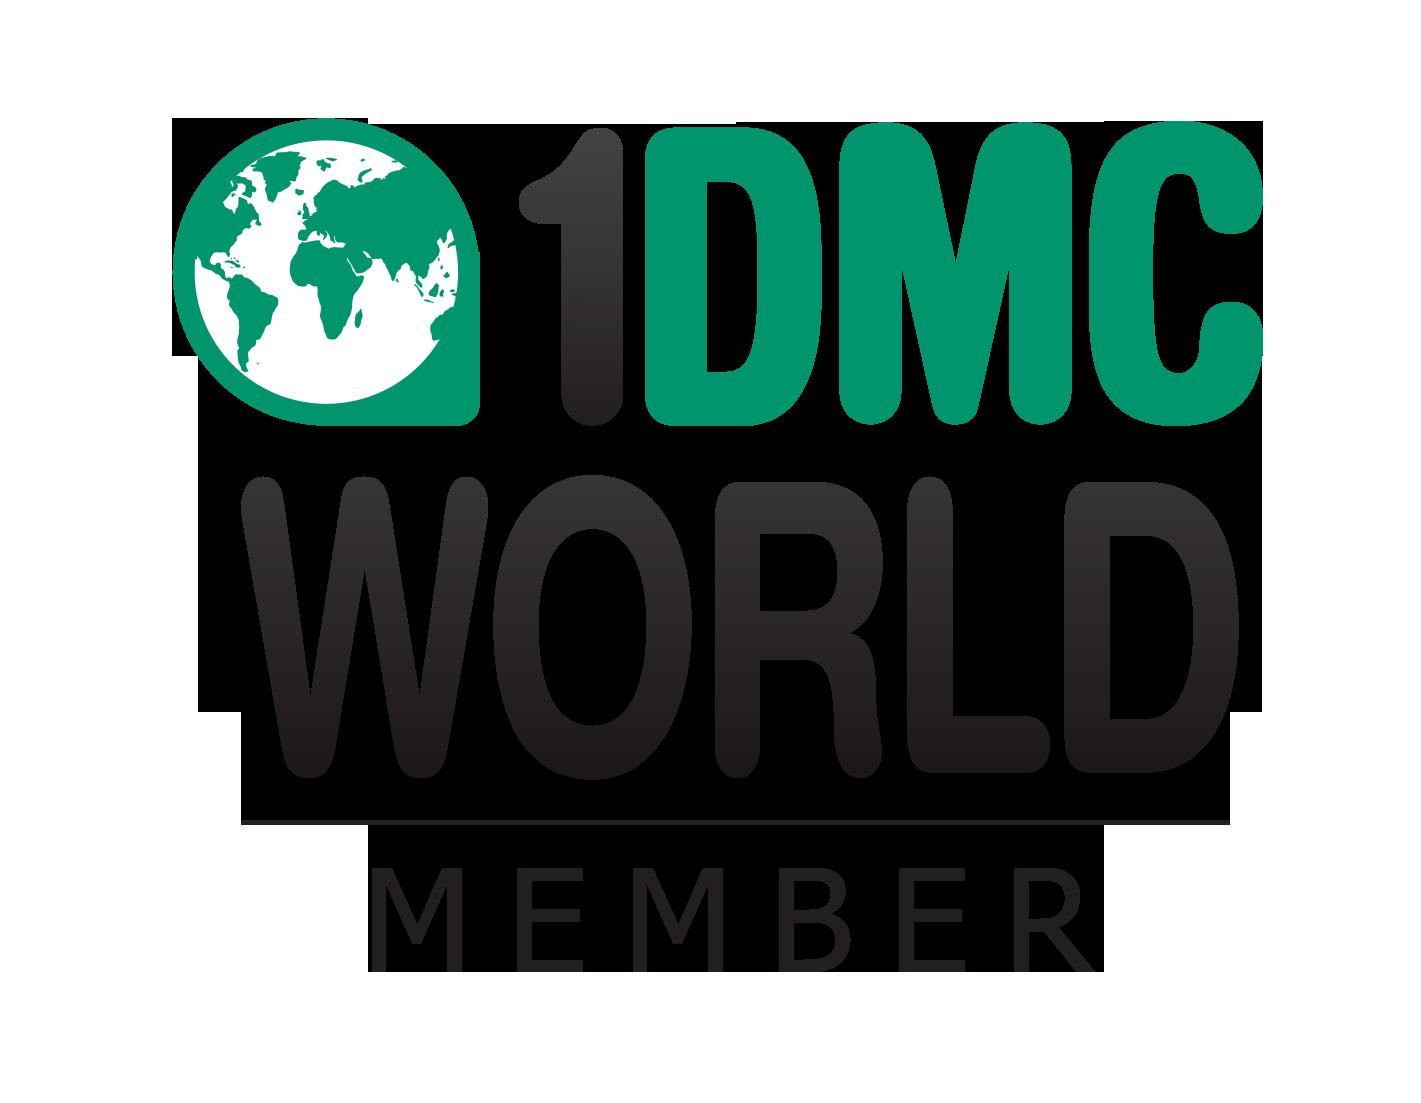 1-DMC-World-member-logo.png